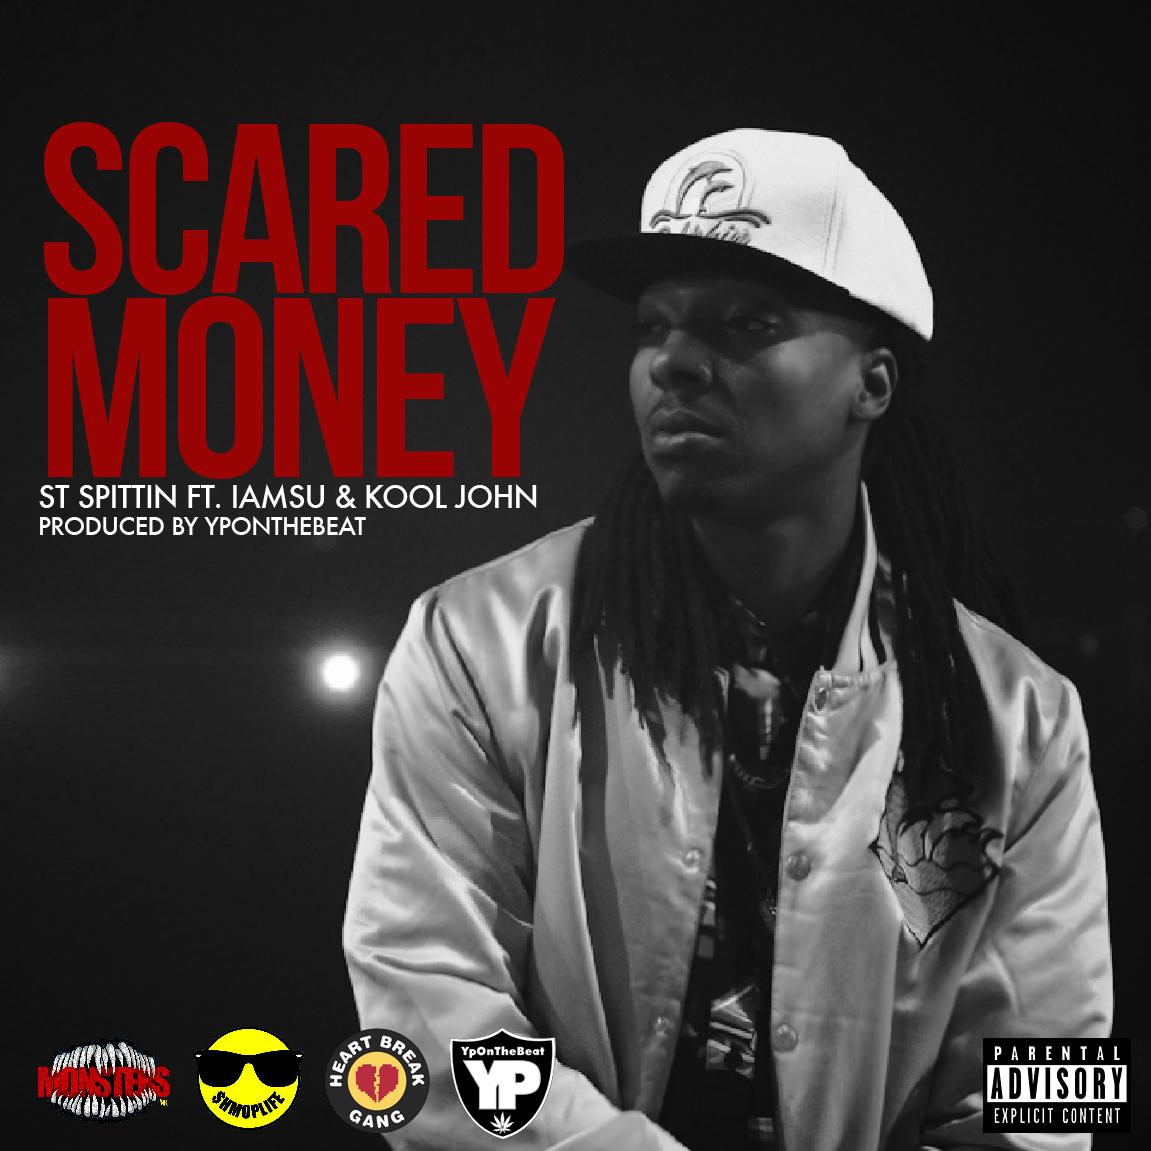 ST Spittin ft. iamsu! & Kool John - Scared Money (prod. YPOnTheBeat) [Thizzler.com Exclusive]